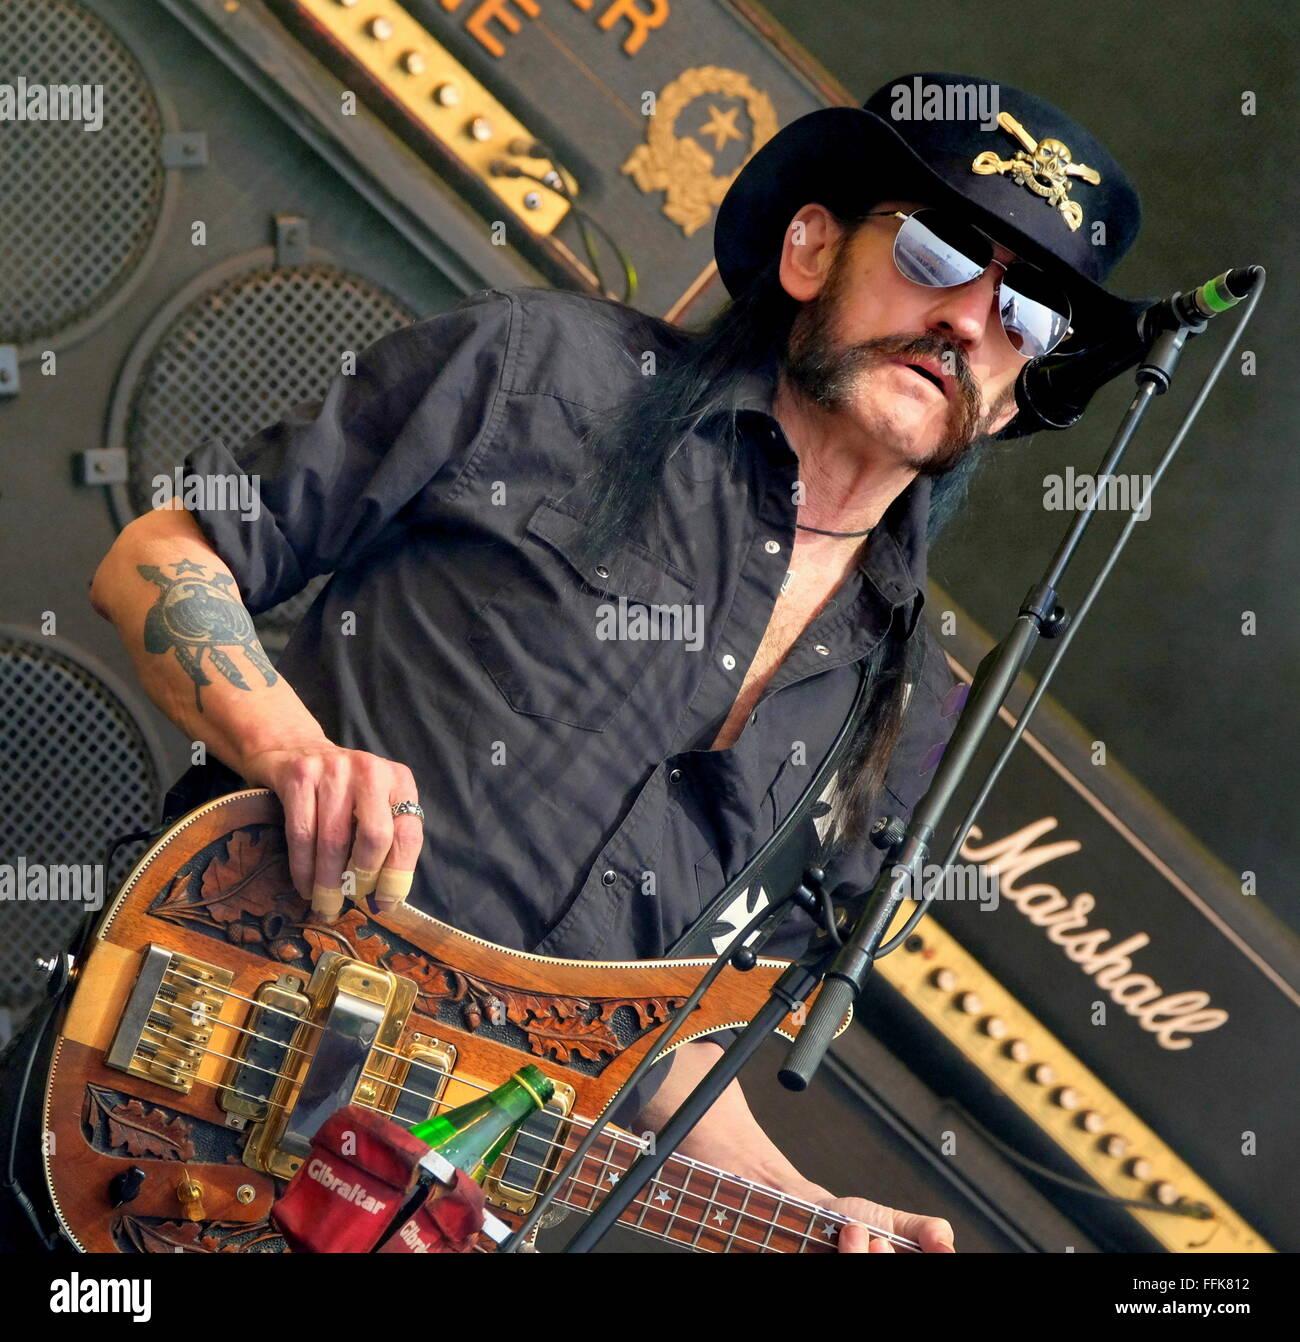 El Festival de Glastonbury, Somerset, el 26 de junio de 2015, Ian Lemmy Kilmister interpretando en vivo con Motorhead Imagen De Stock